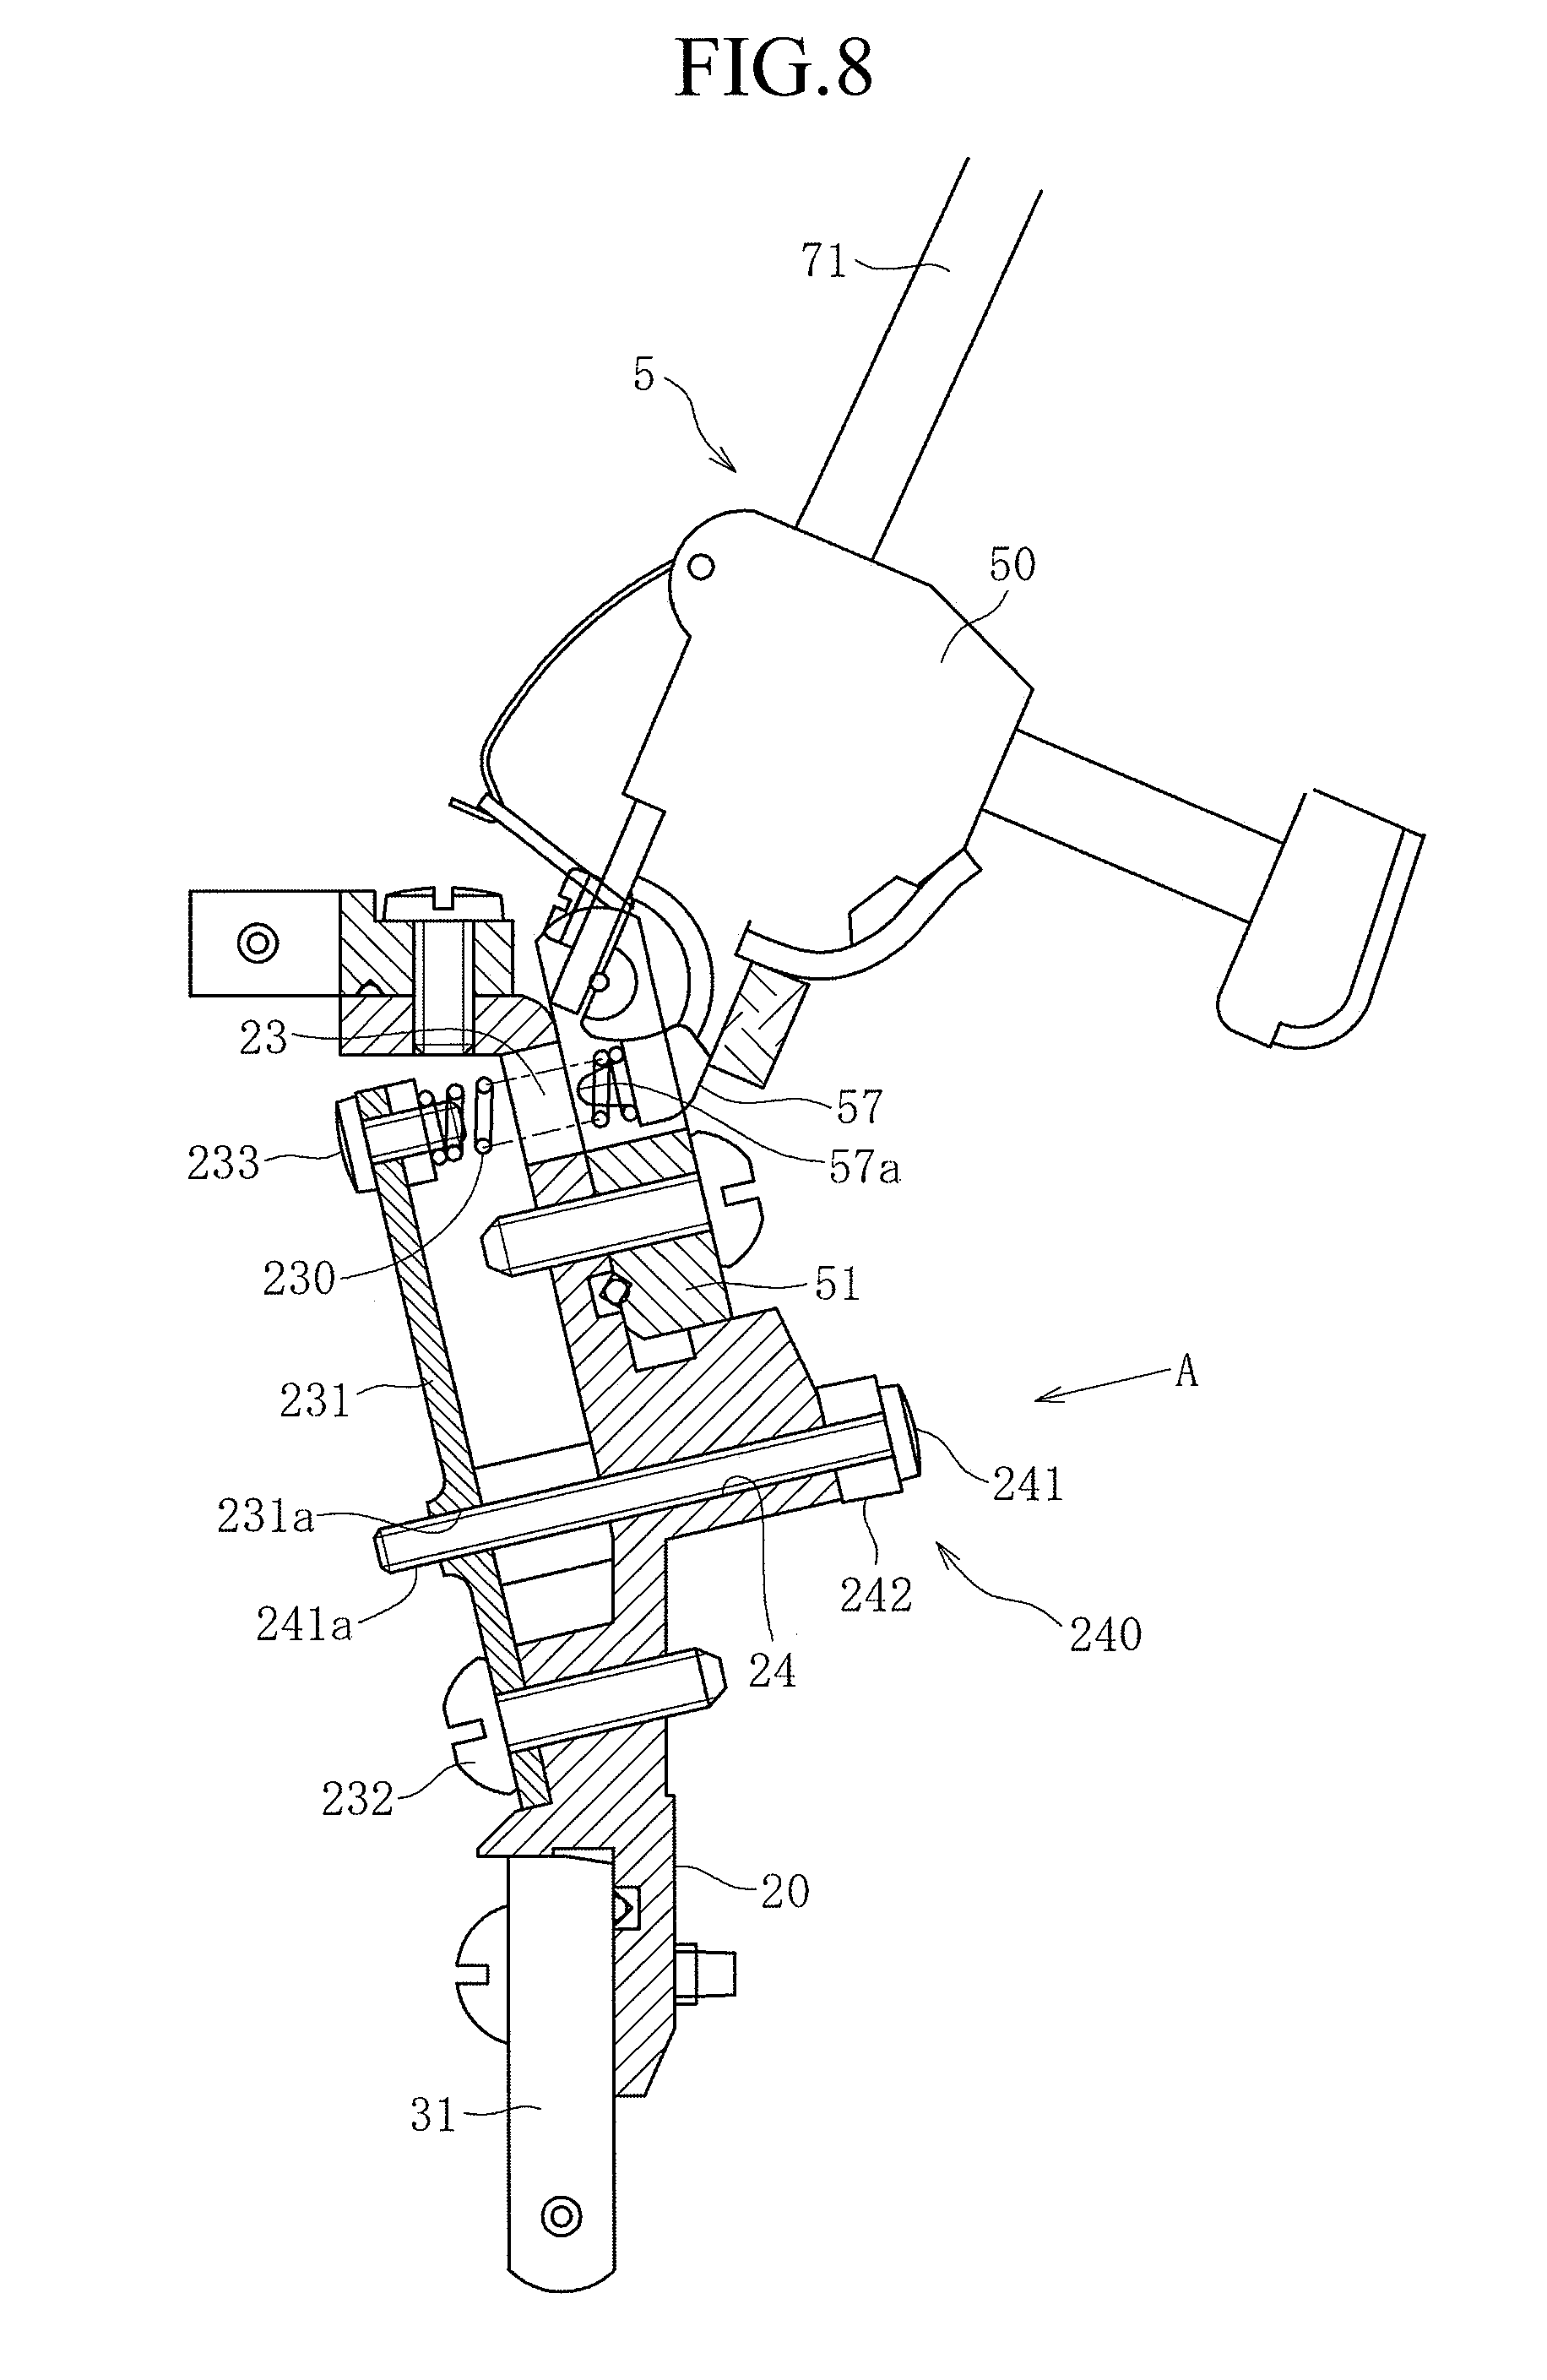 Brevet Us8389833 Upright Piano Type Action Google Brevets Isuzu Trooper Trailer Wiring Diagram Patent Drawing